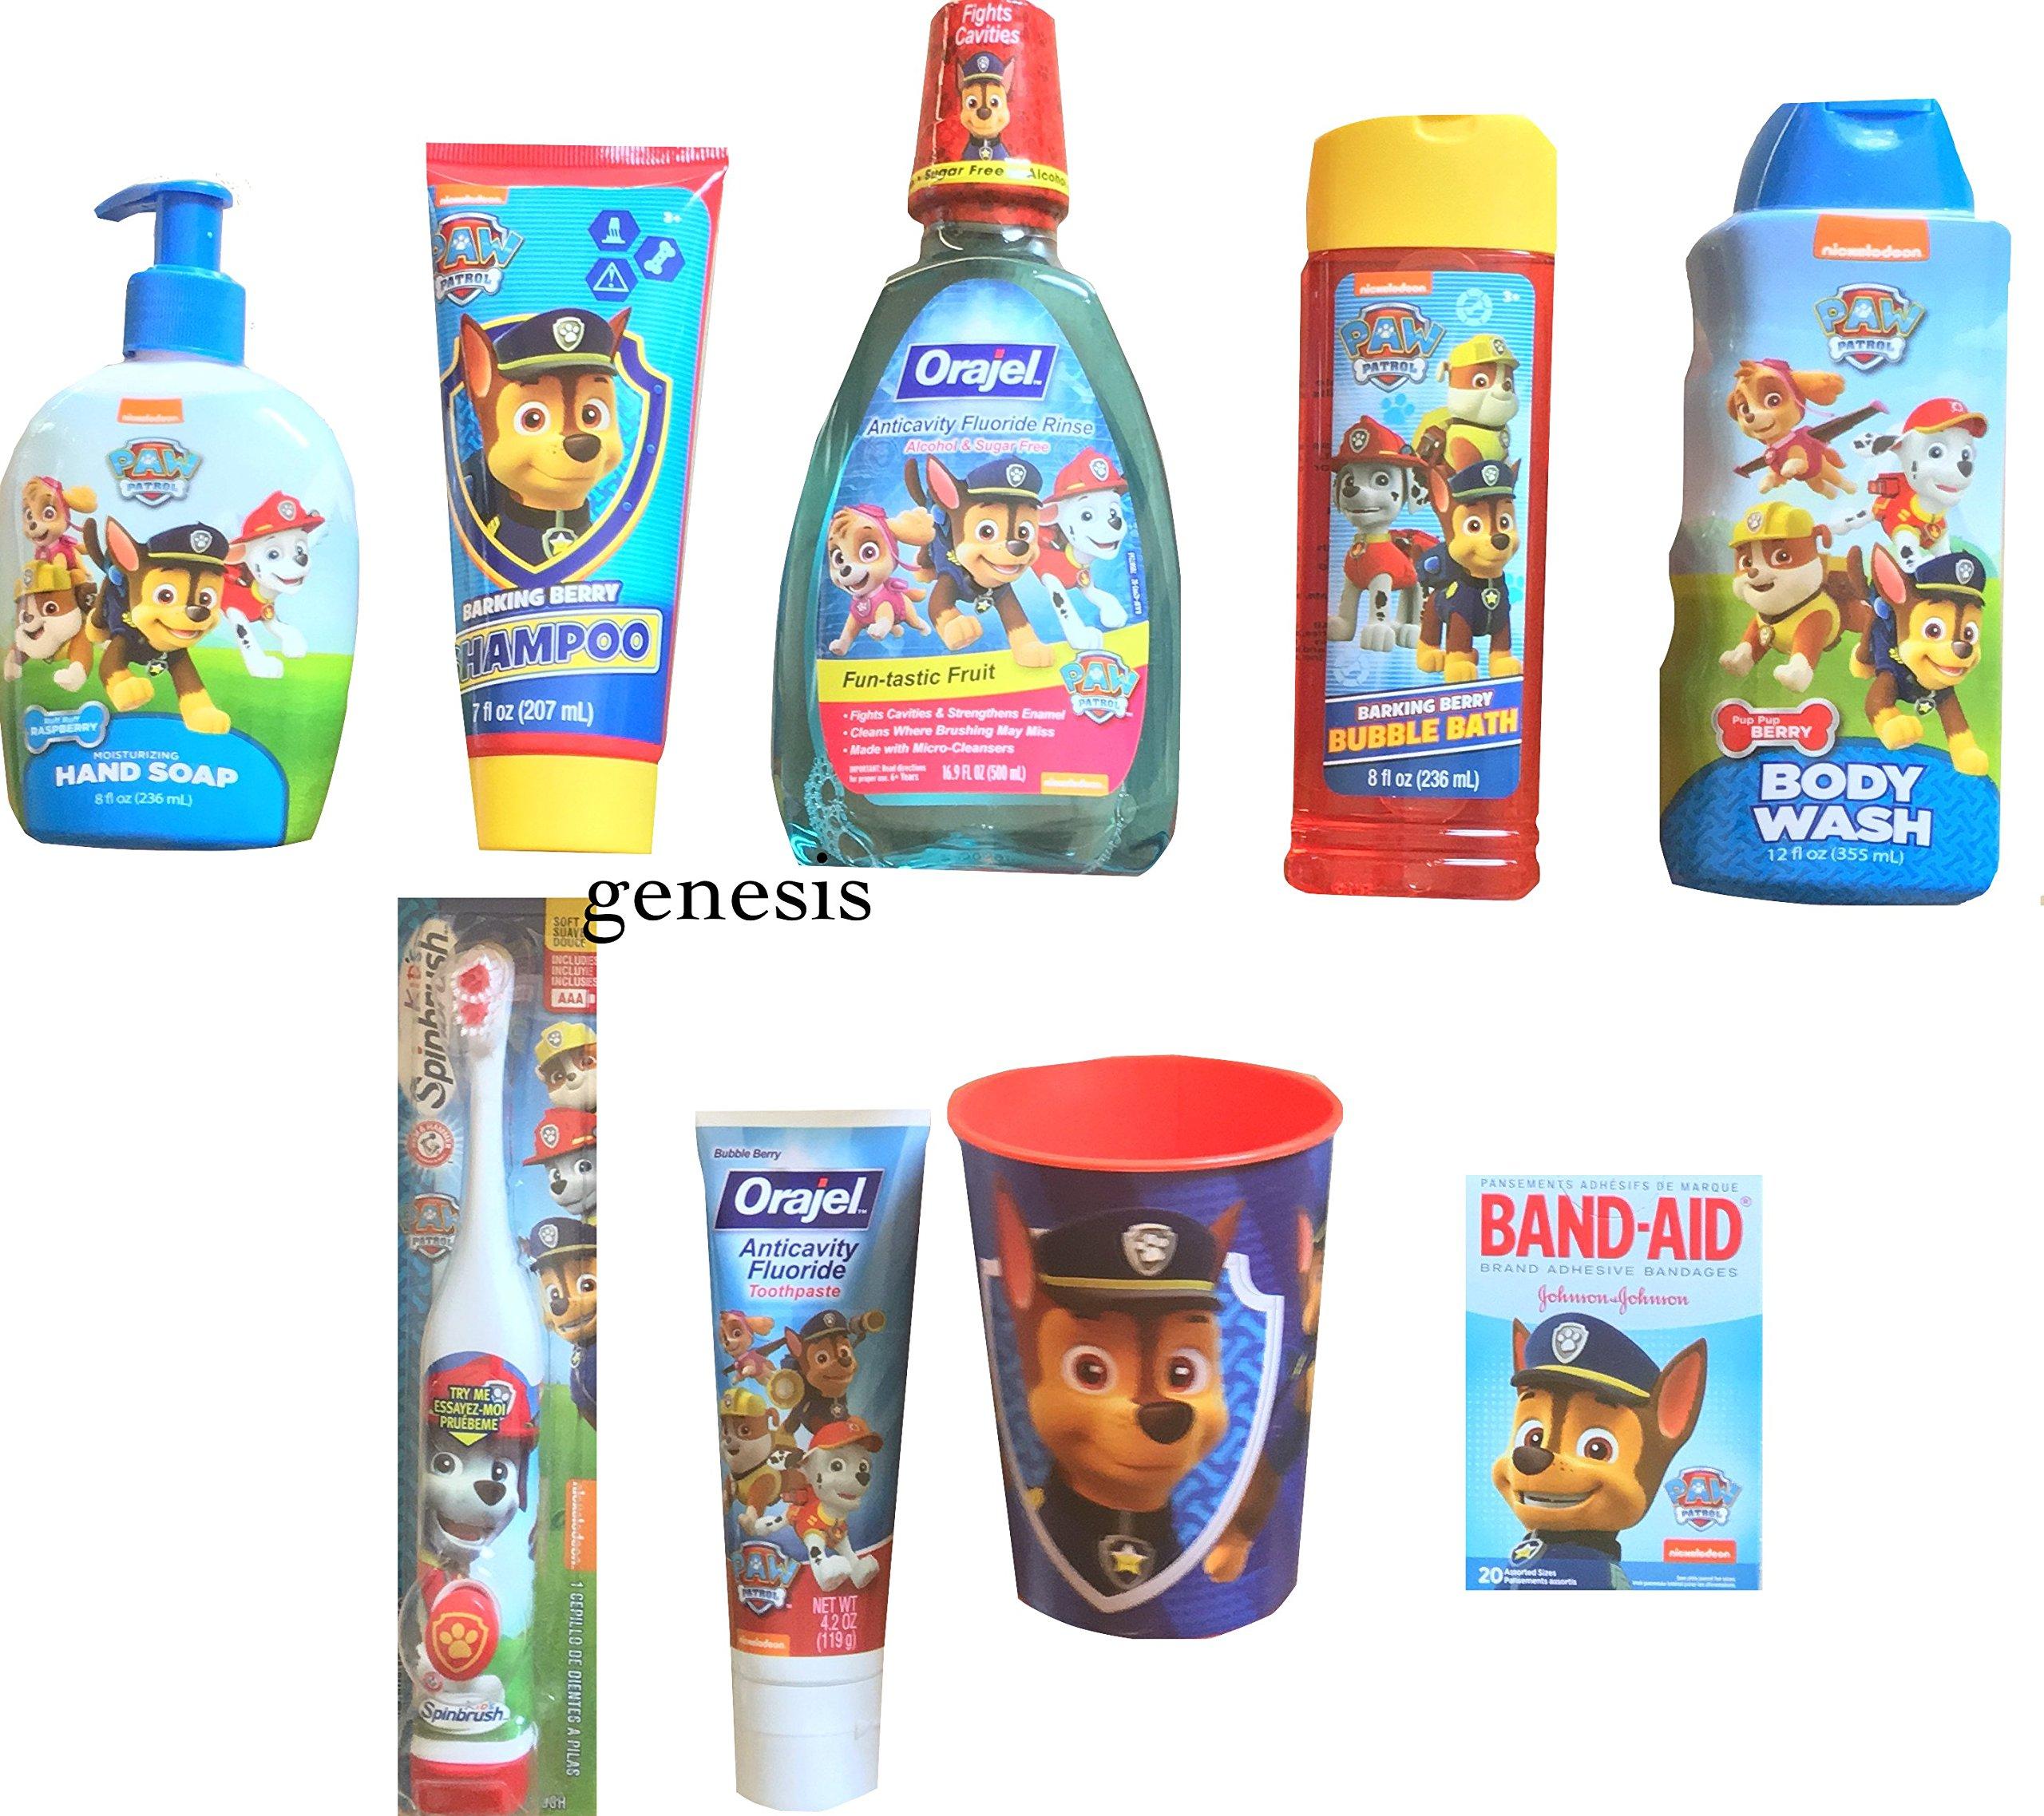 Paw Patrol Children's Bathroom Shampoo, Body Wash, Bubble Bath & Dental Kit Gift Set 9 Pcs by PAW